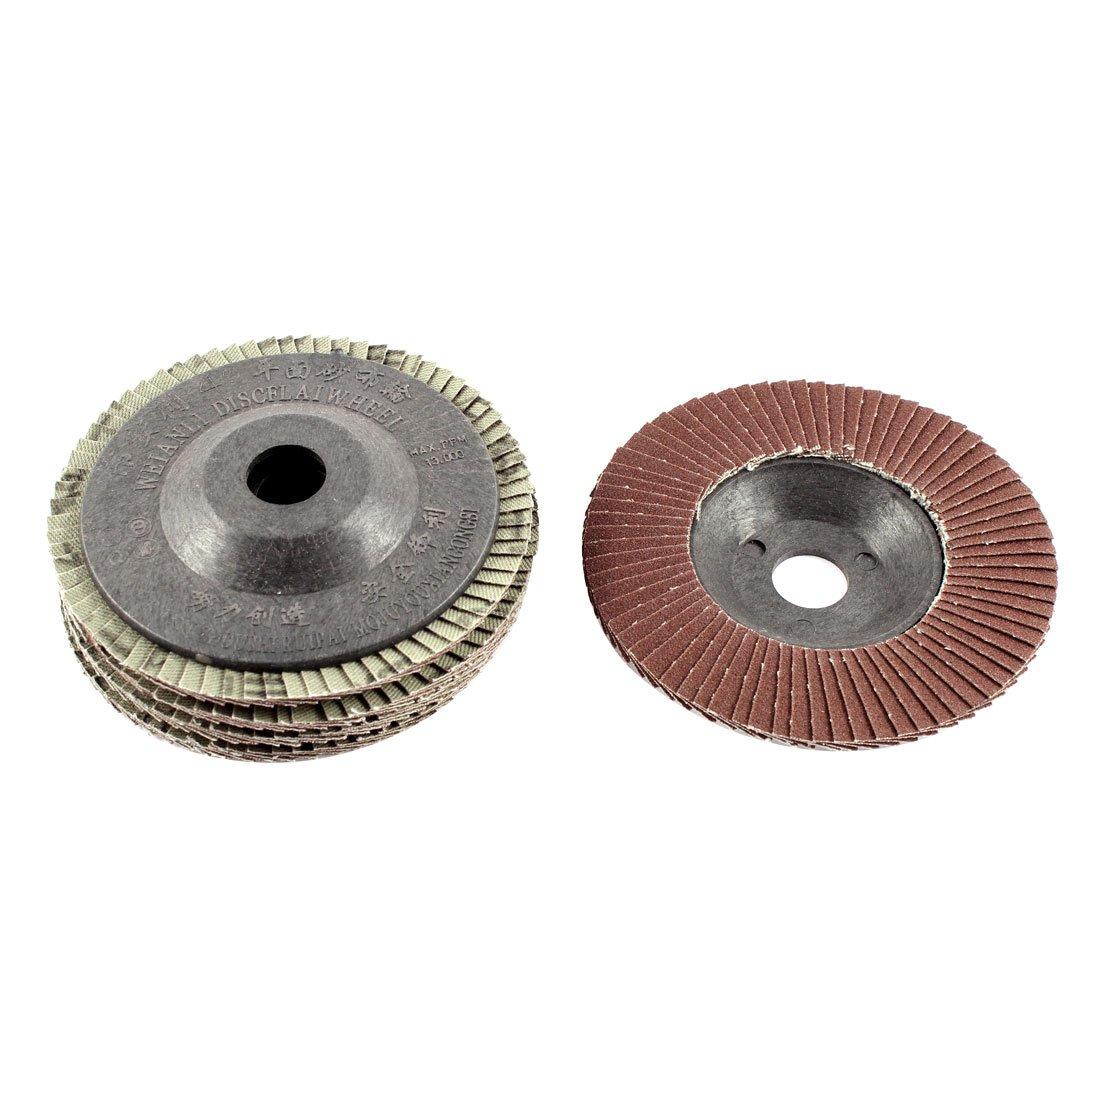 uxcell 4'' x 5/8'' 120 Grit Flap Sanding Discs Polish Grinding Wheel 5pcs